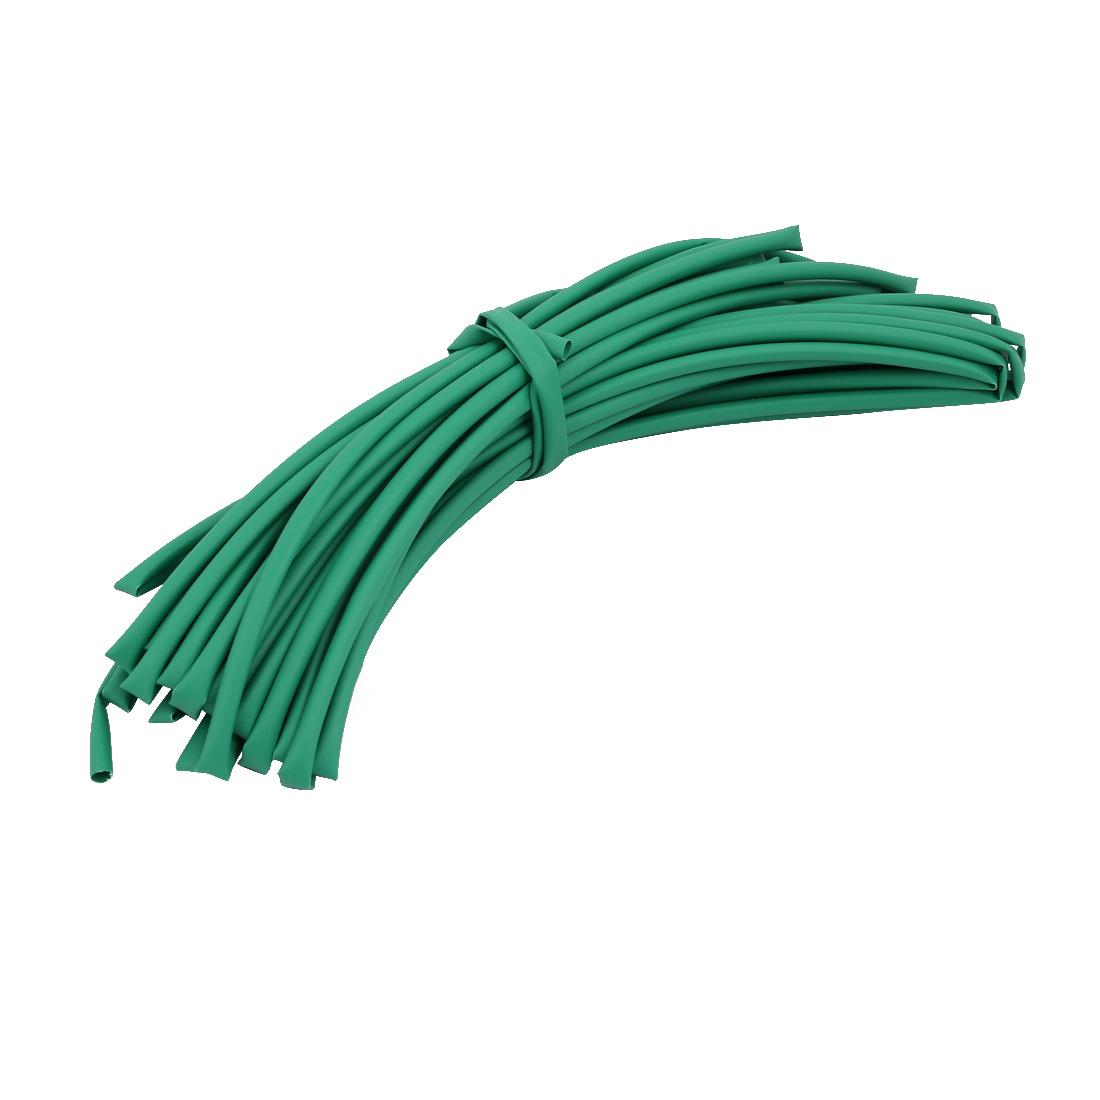 15M 0.2in Inner Dia Polyolefin Flame Retardant Tube Green for Wire Repairing